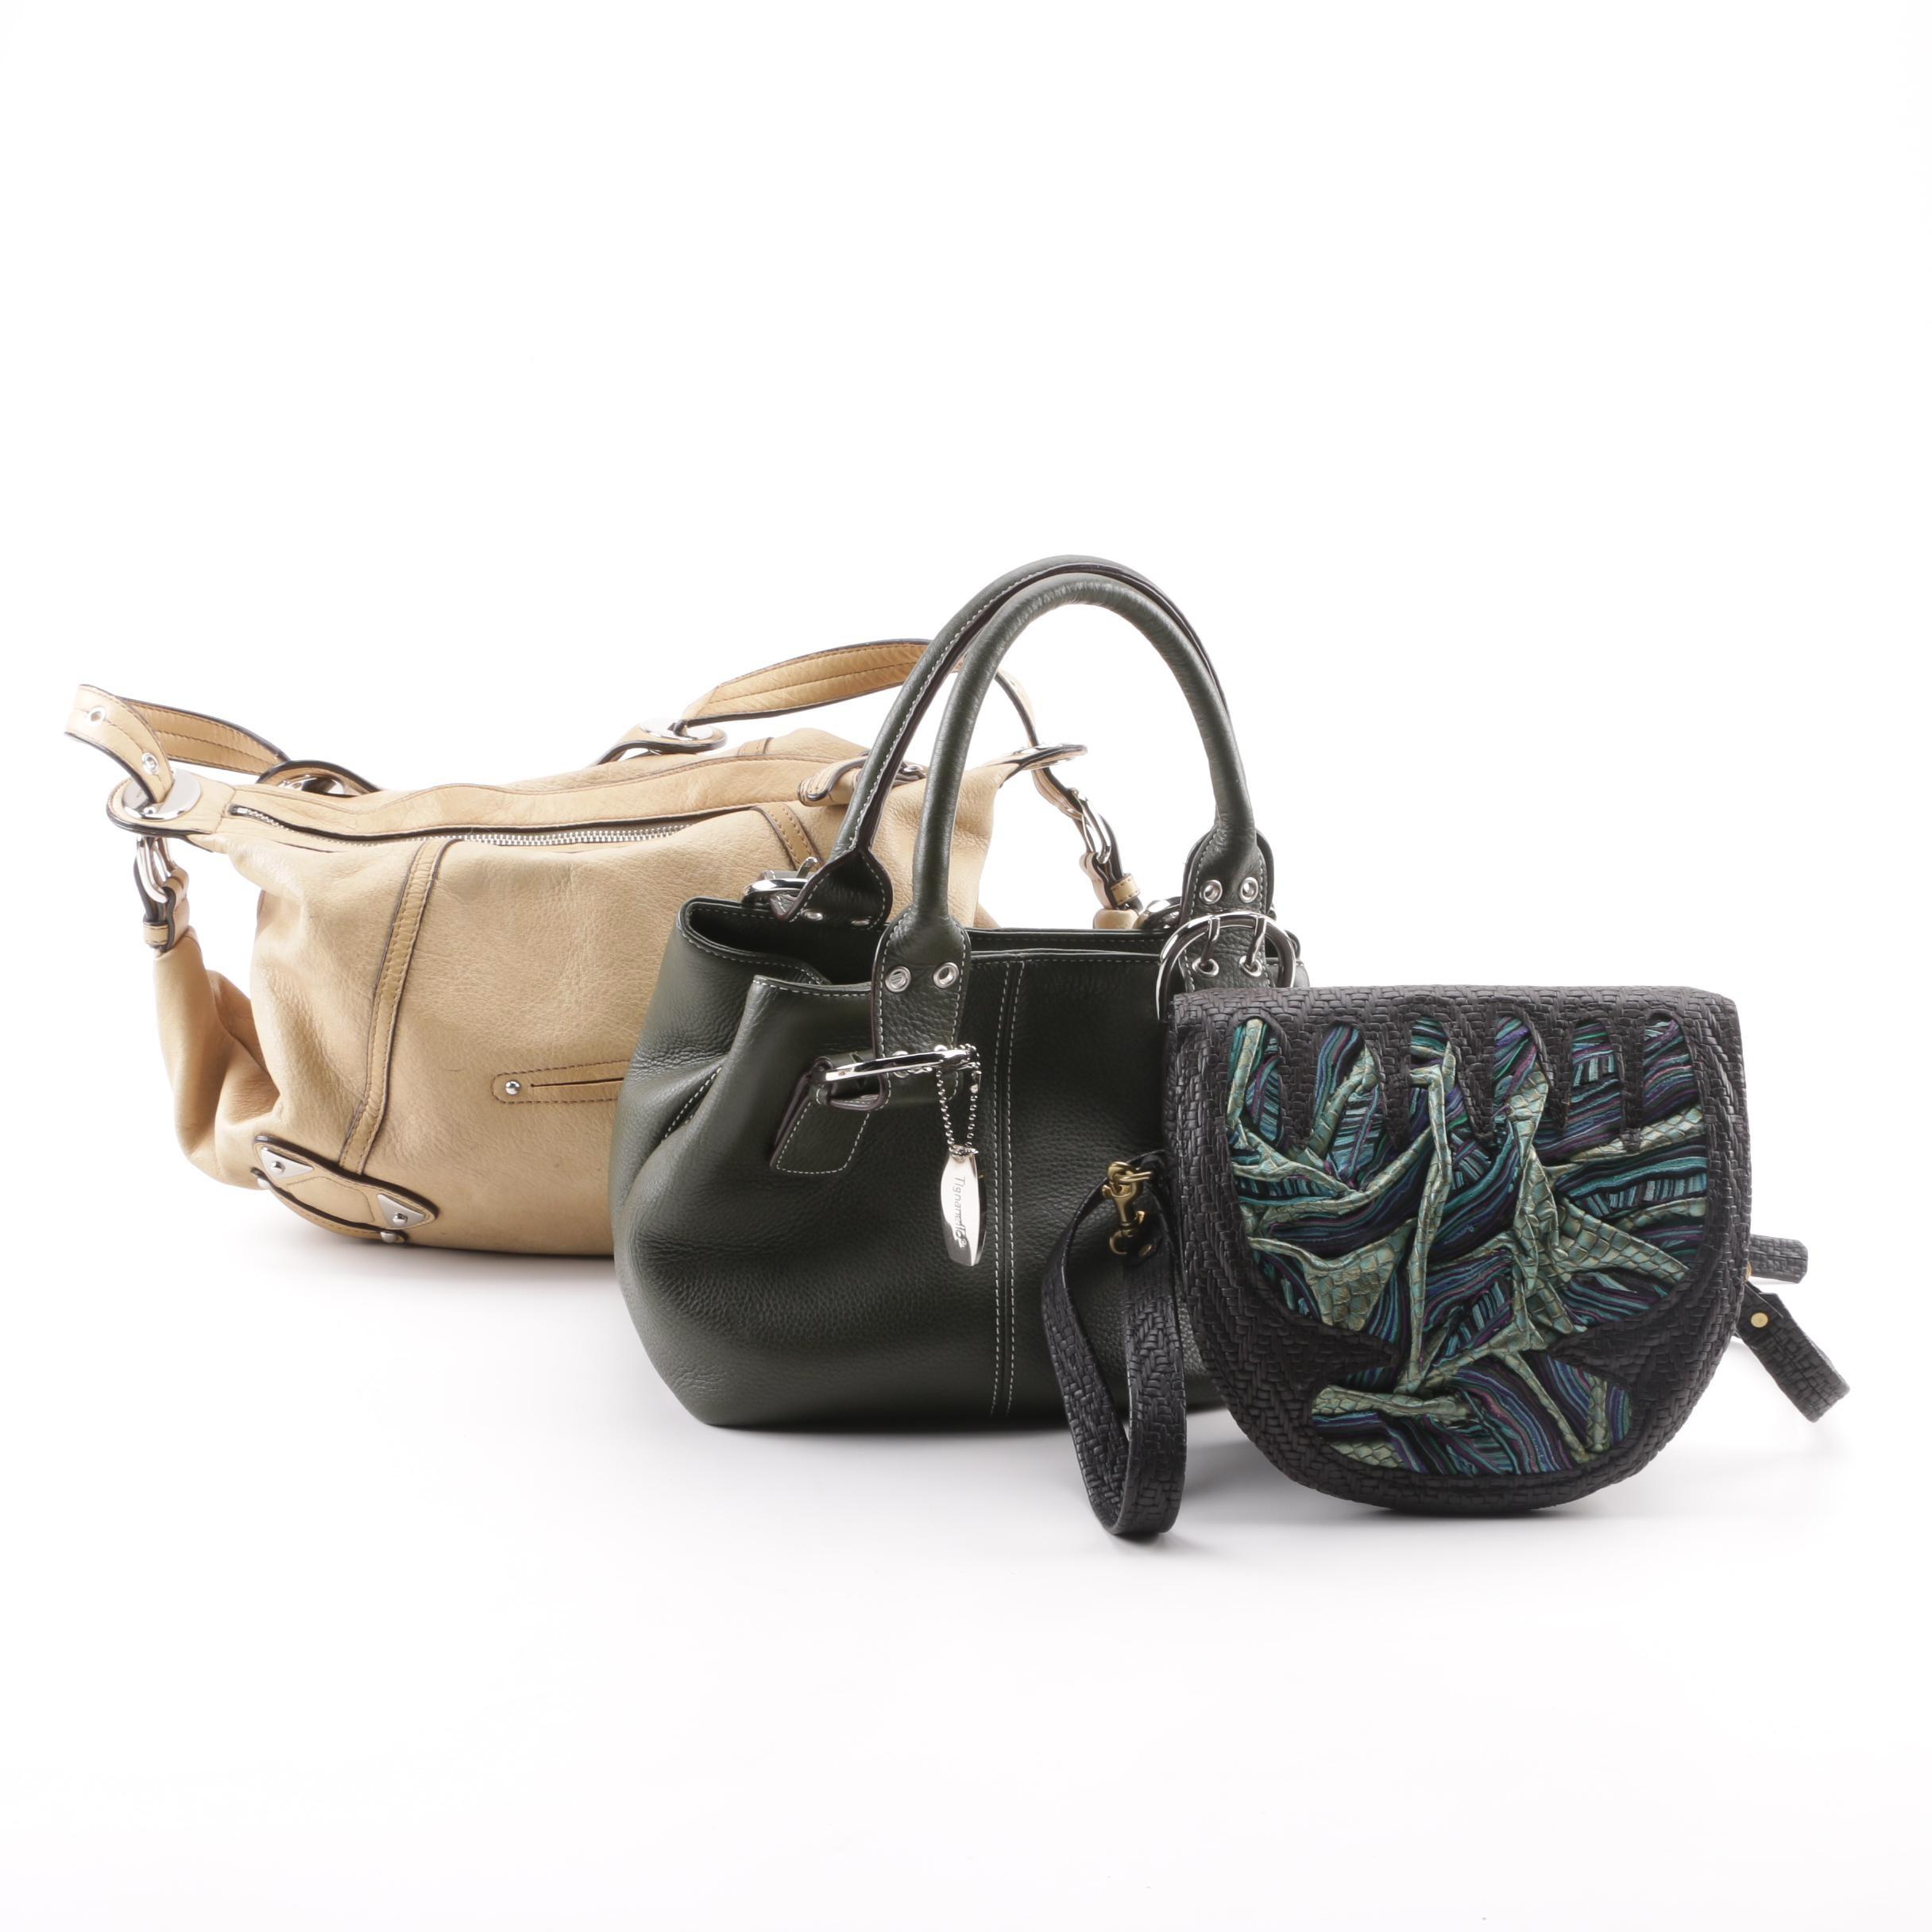 B. Makowsky, Tignanello and Artisan Leather Handbags